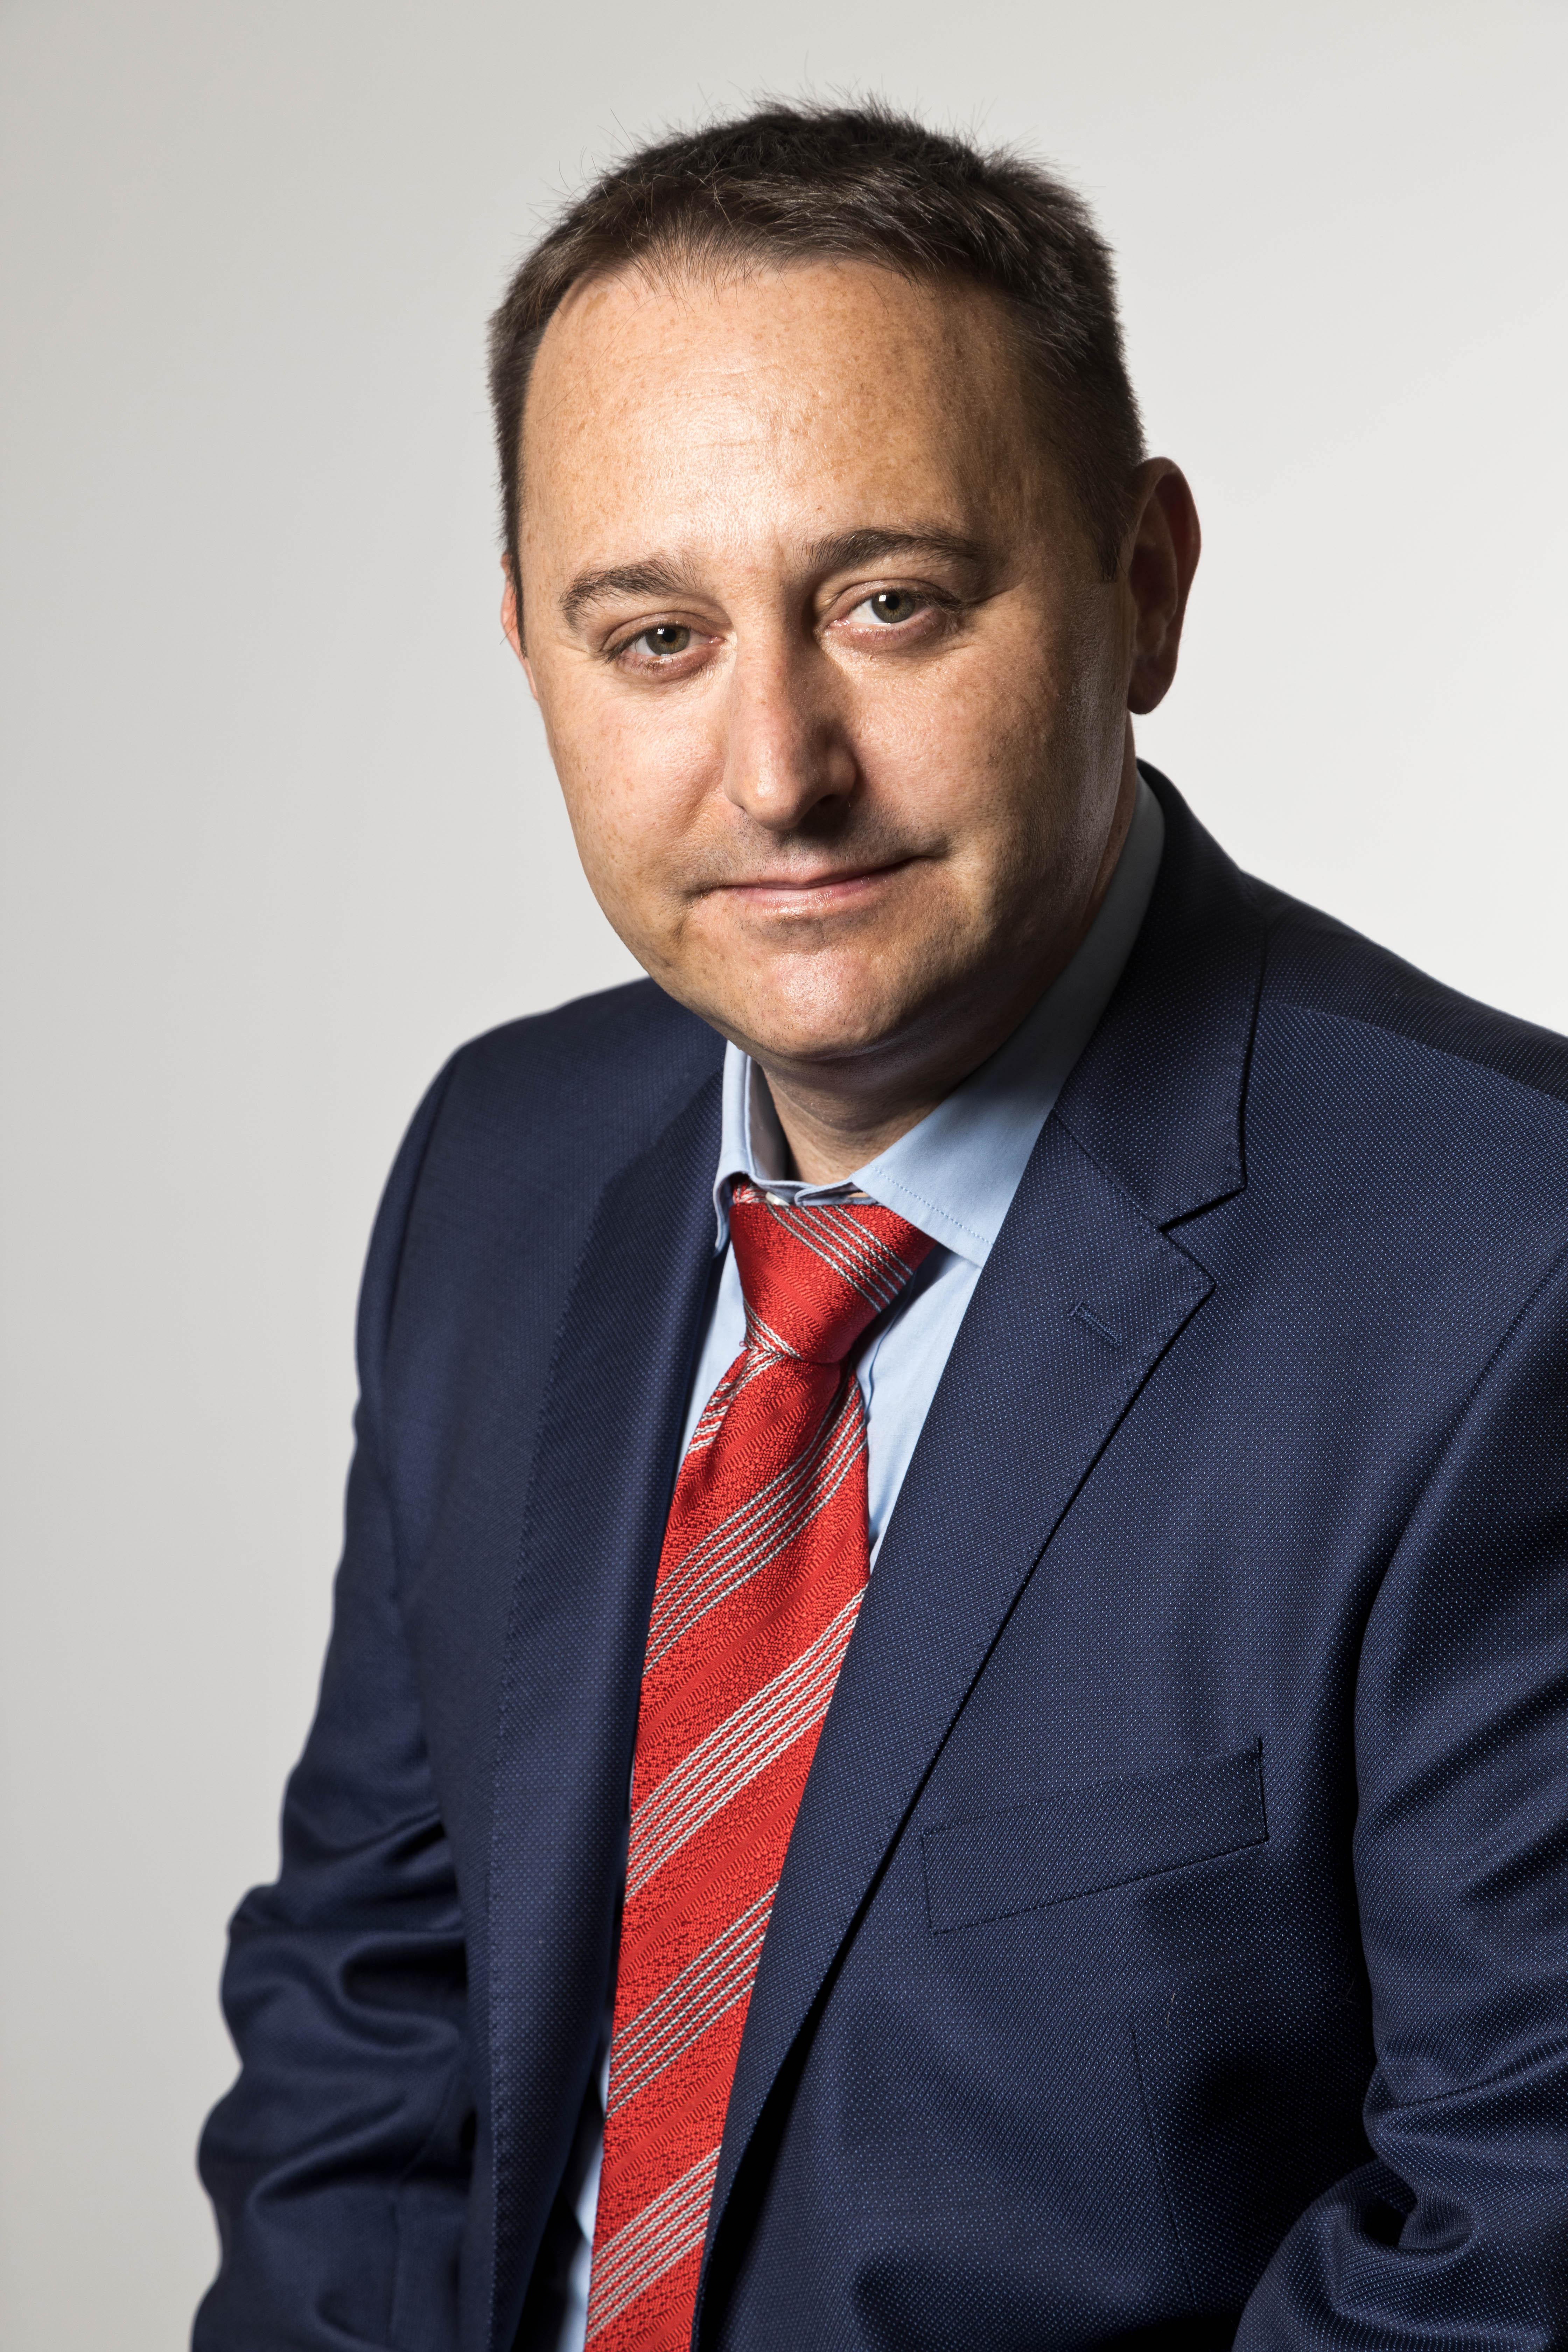 Ester Molné Soldevila